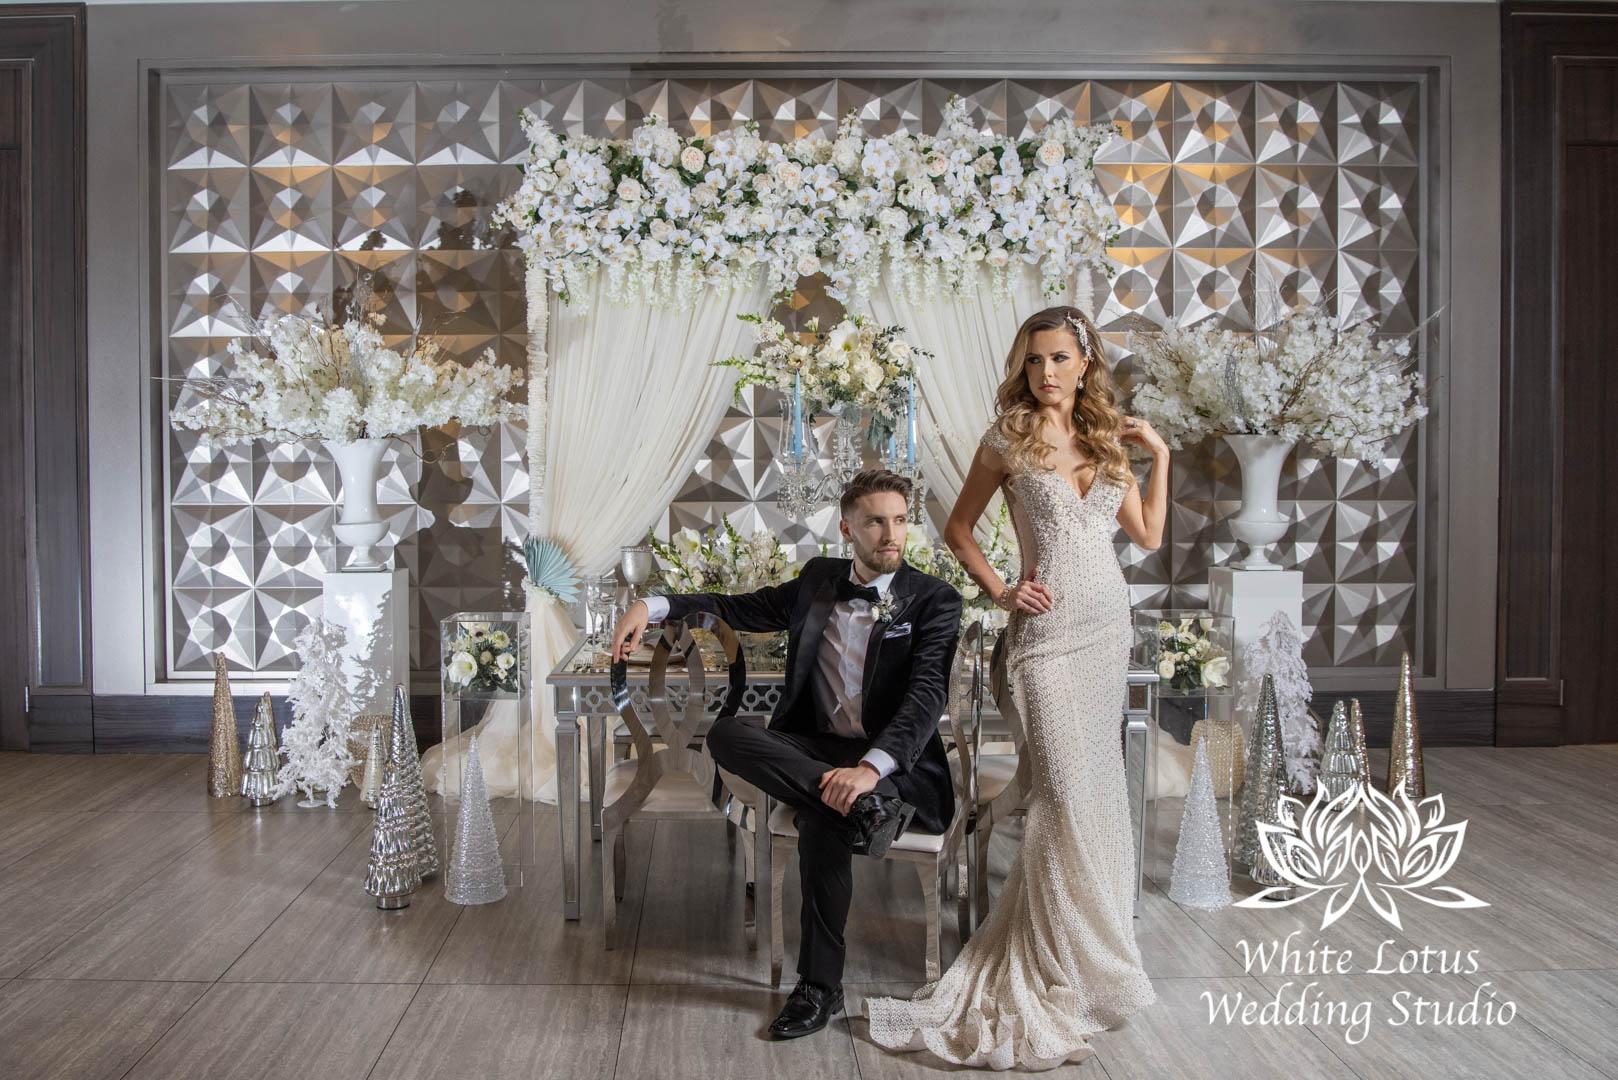 137- GLAM WINTERLUXE WEDDING INSPIRATION